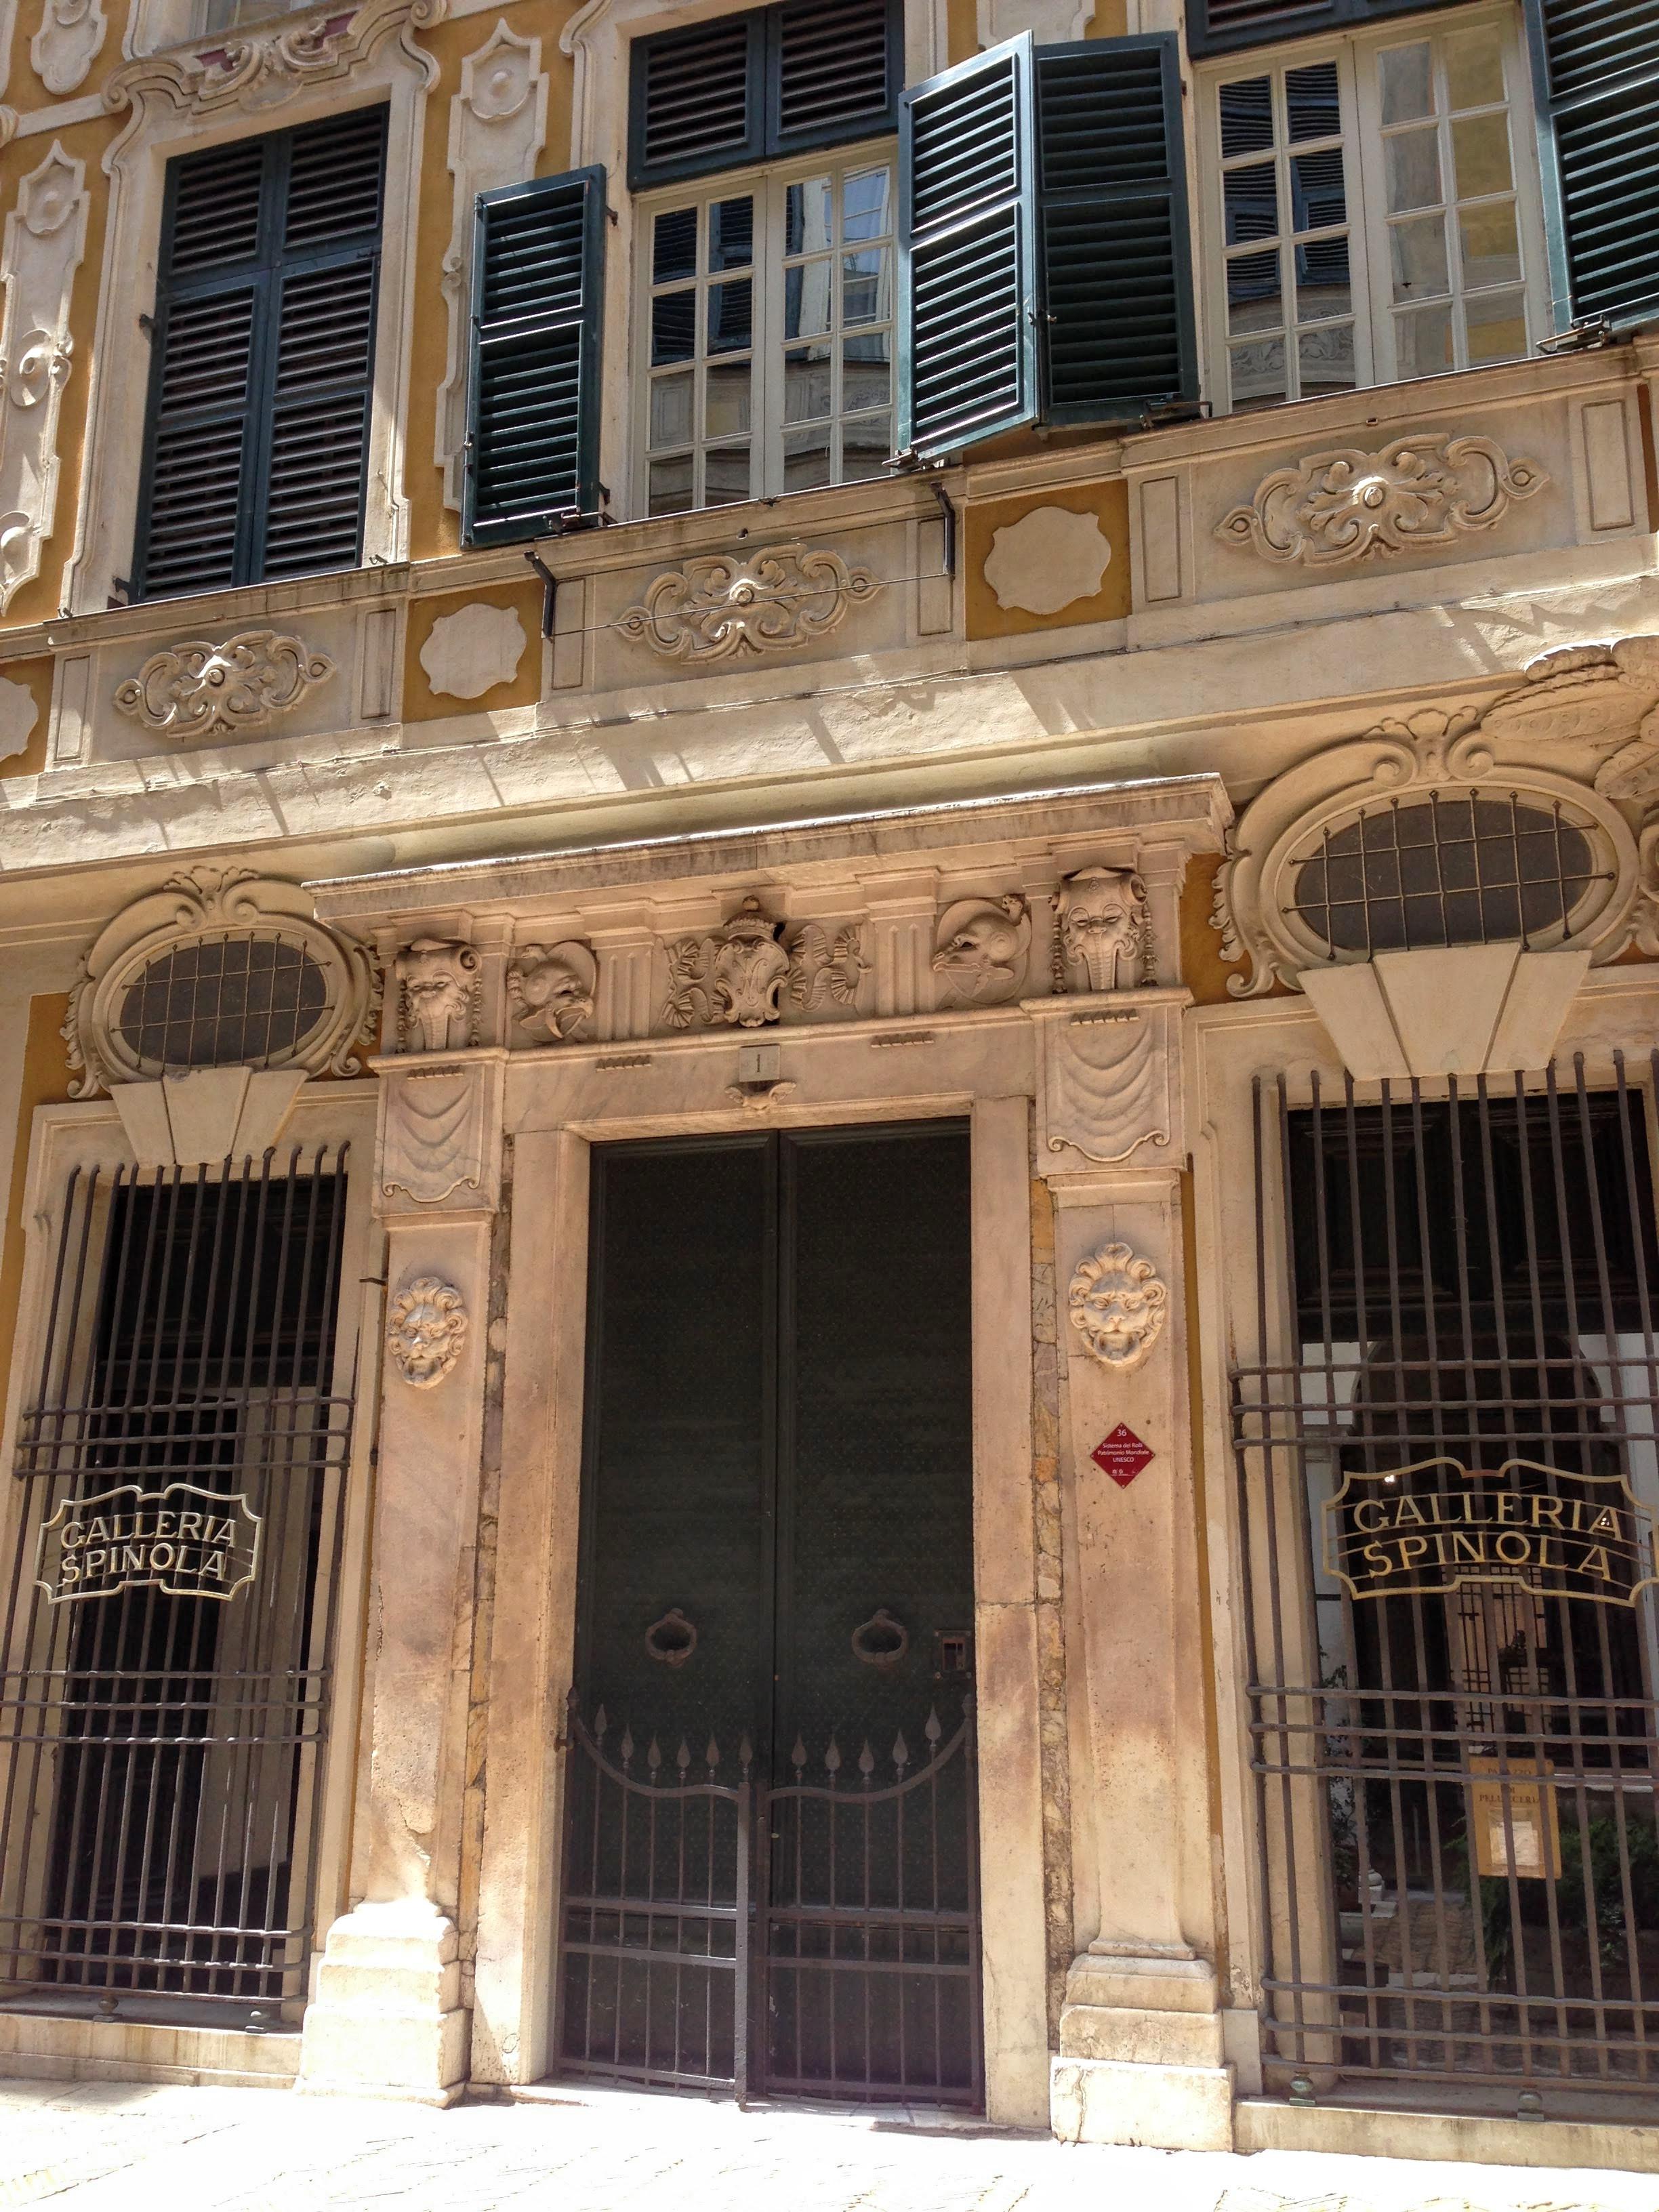 Genova Museum Galleria Spinola Italy